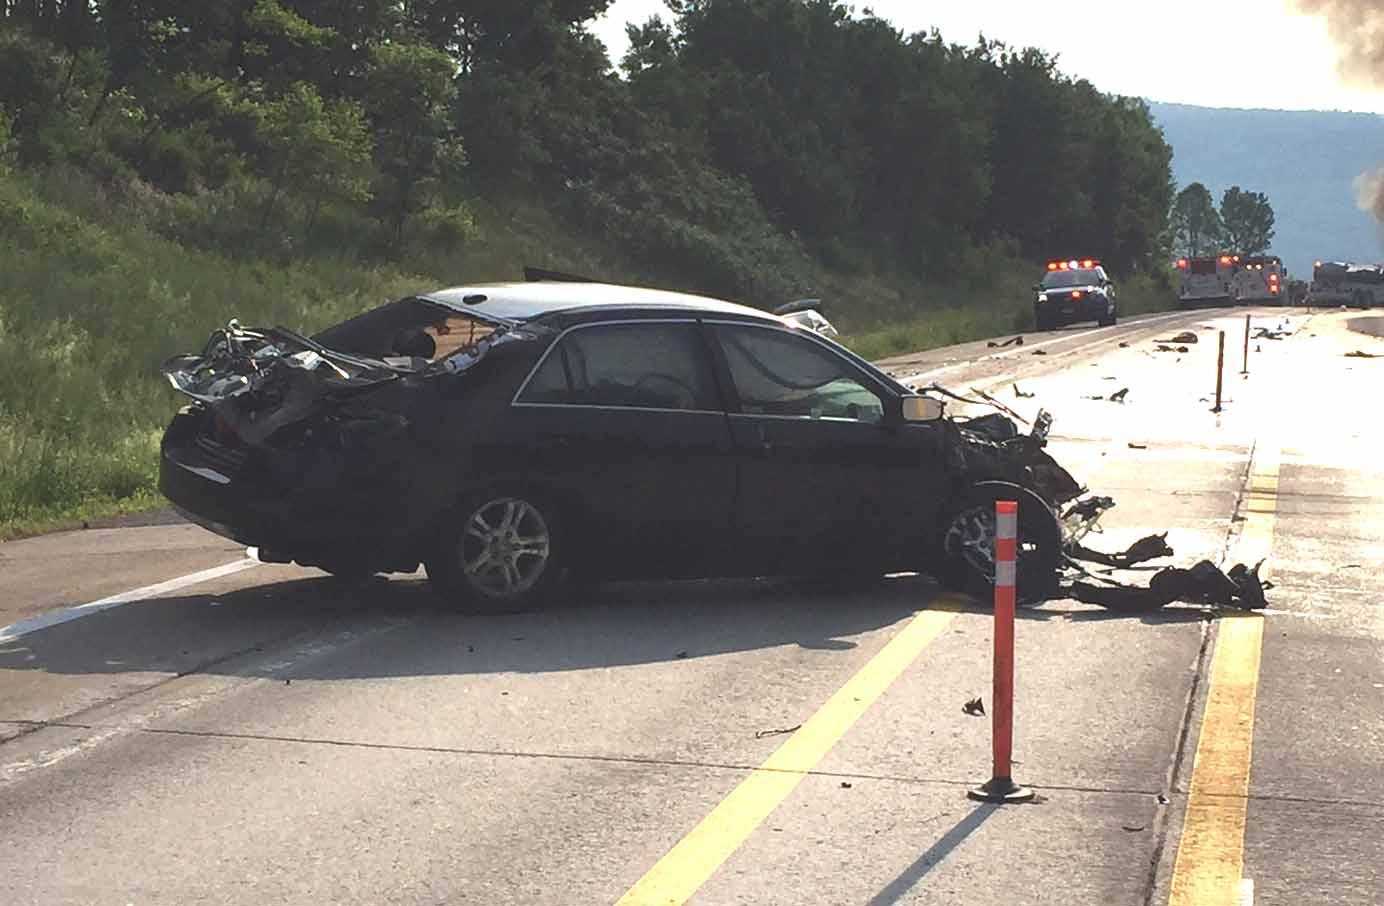 Car Hits Tractor Trailer; I-88 Closed Between Exit 12/13